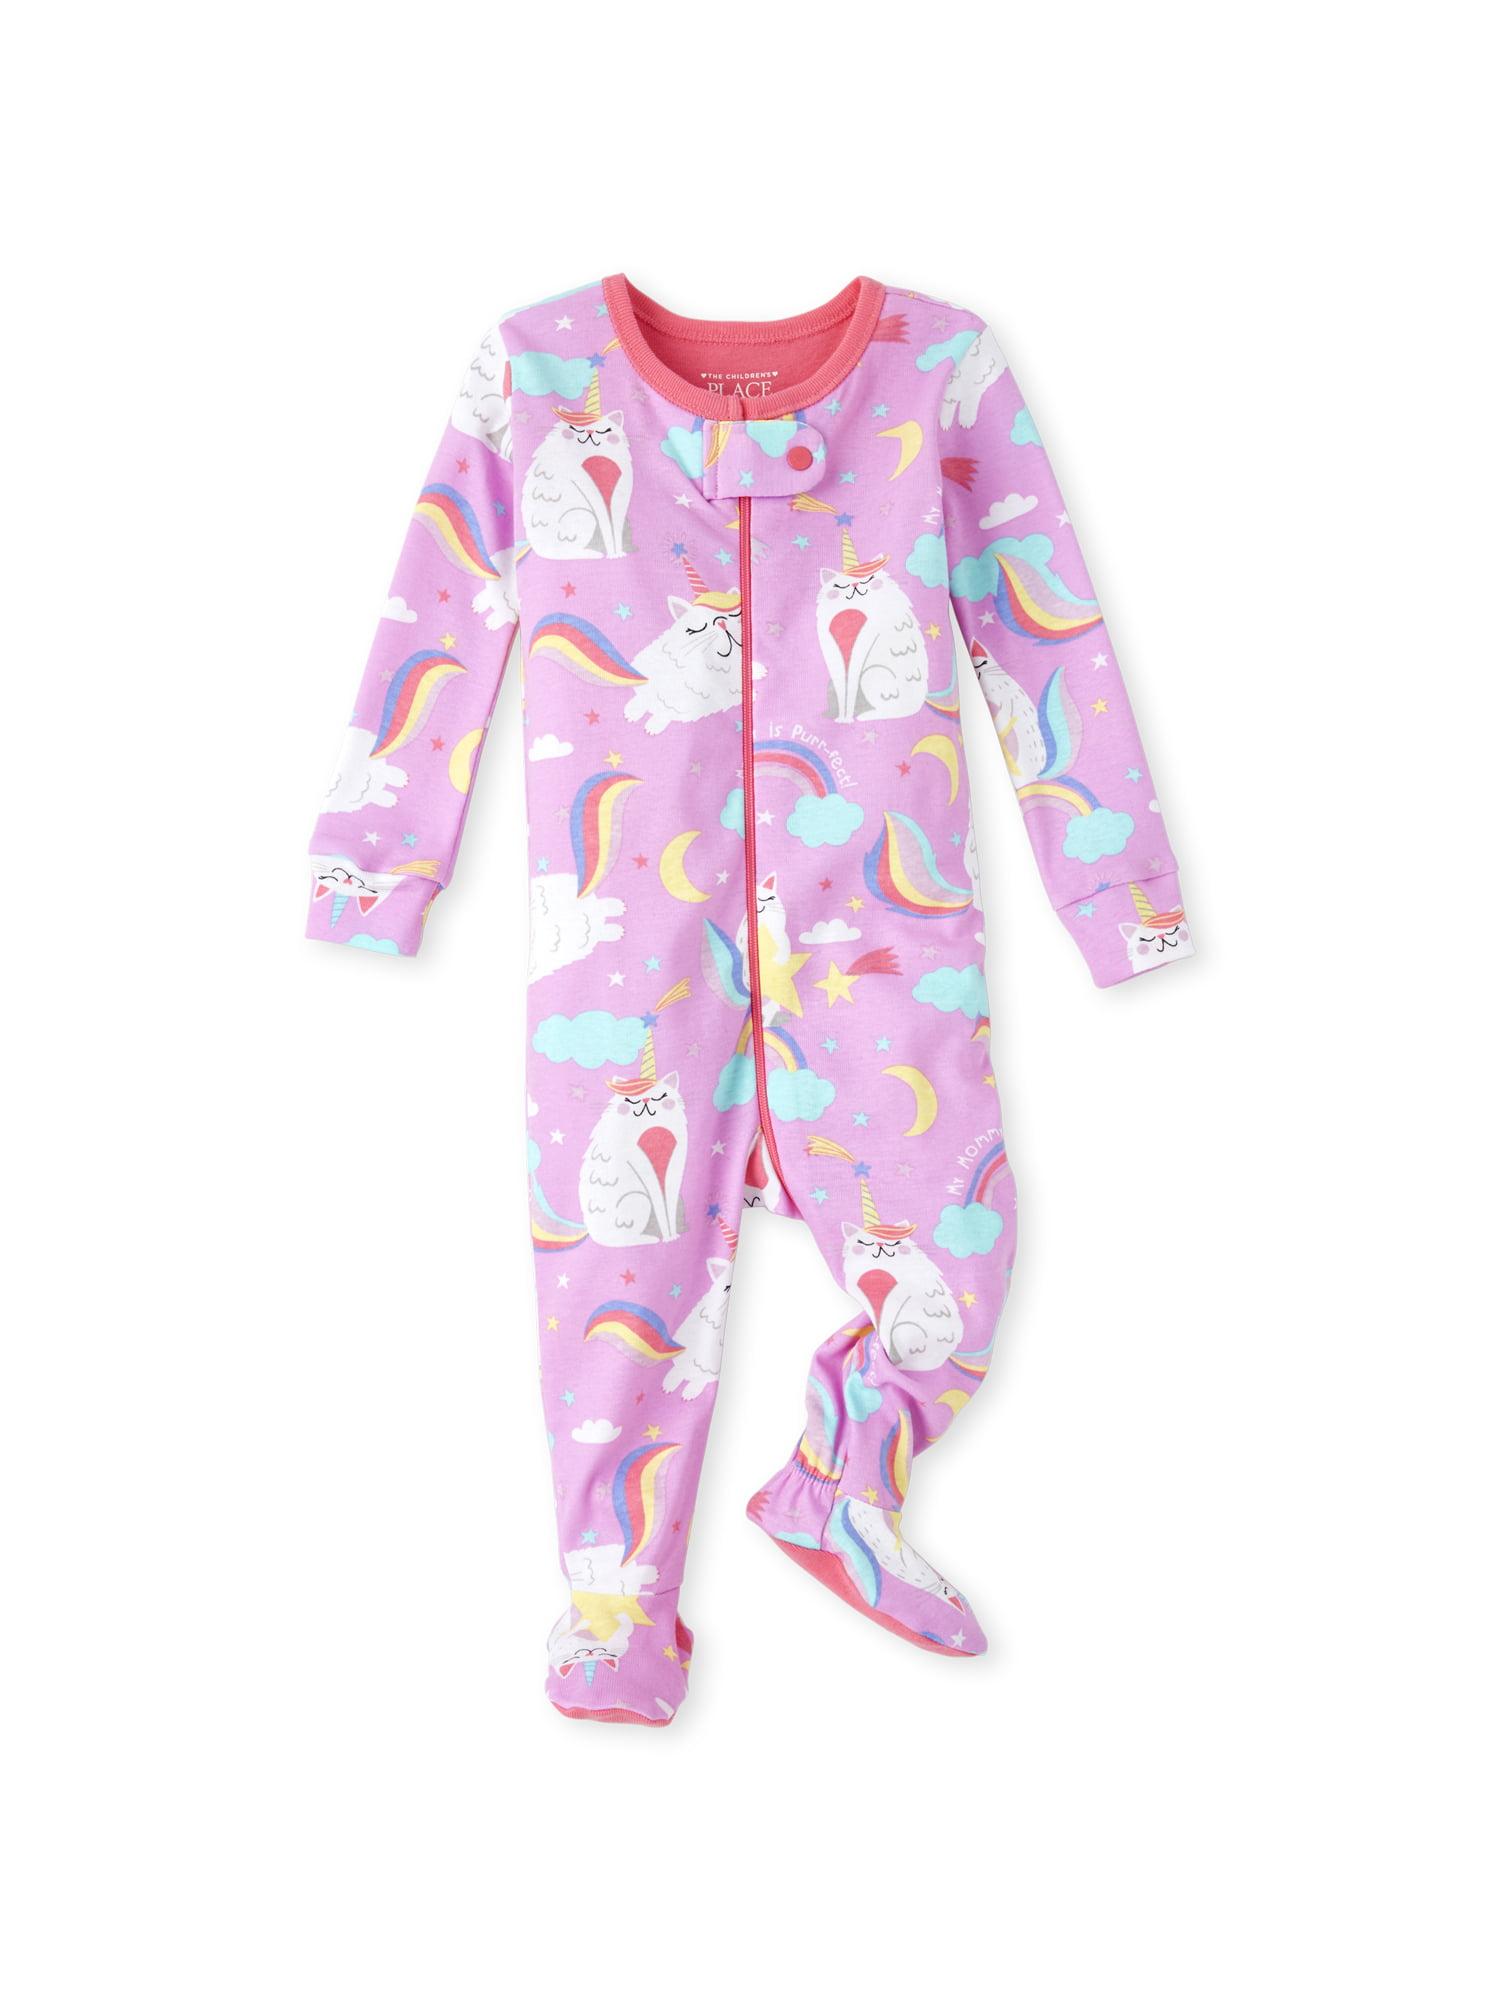 Toddler Baby Boy Girl Long Sleeve Jumpsuit Simple Autism Kid Pajamas